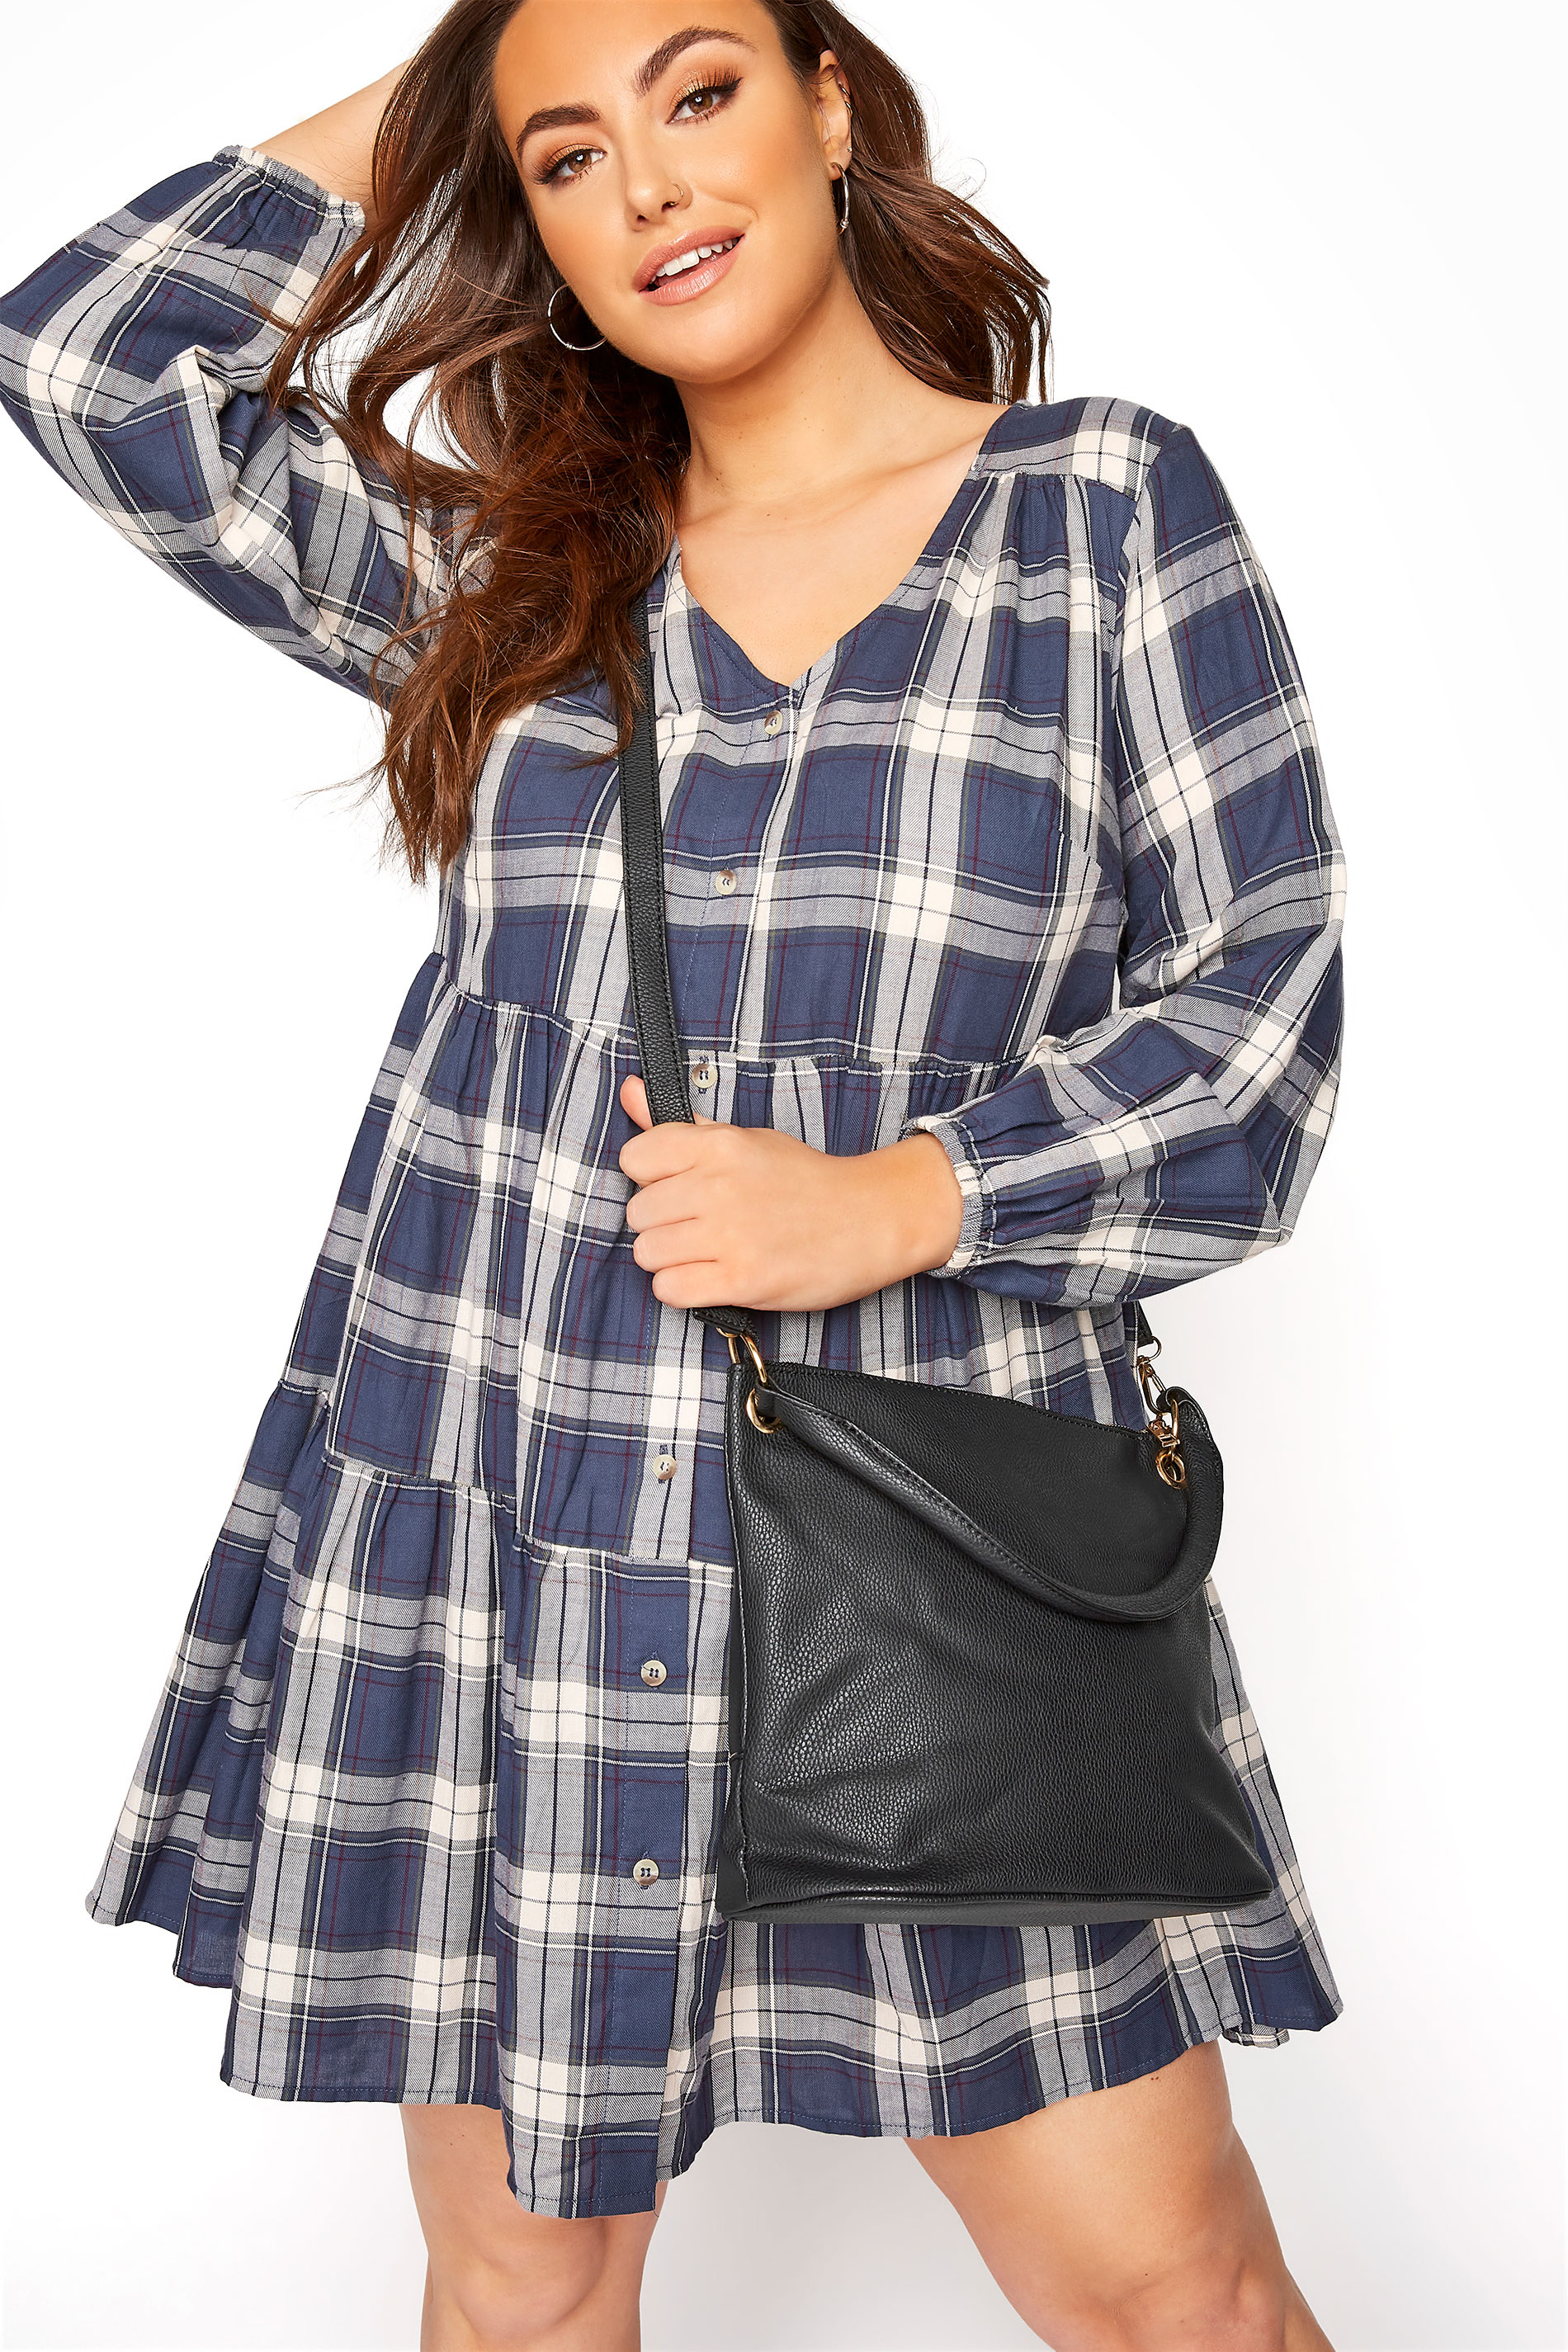 Black Dual Strap Zip Detail Shoulder Bag